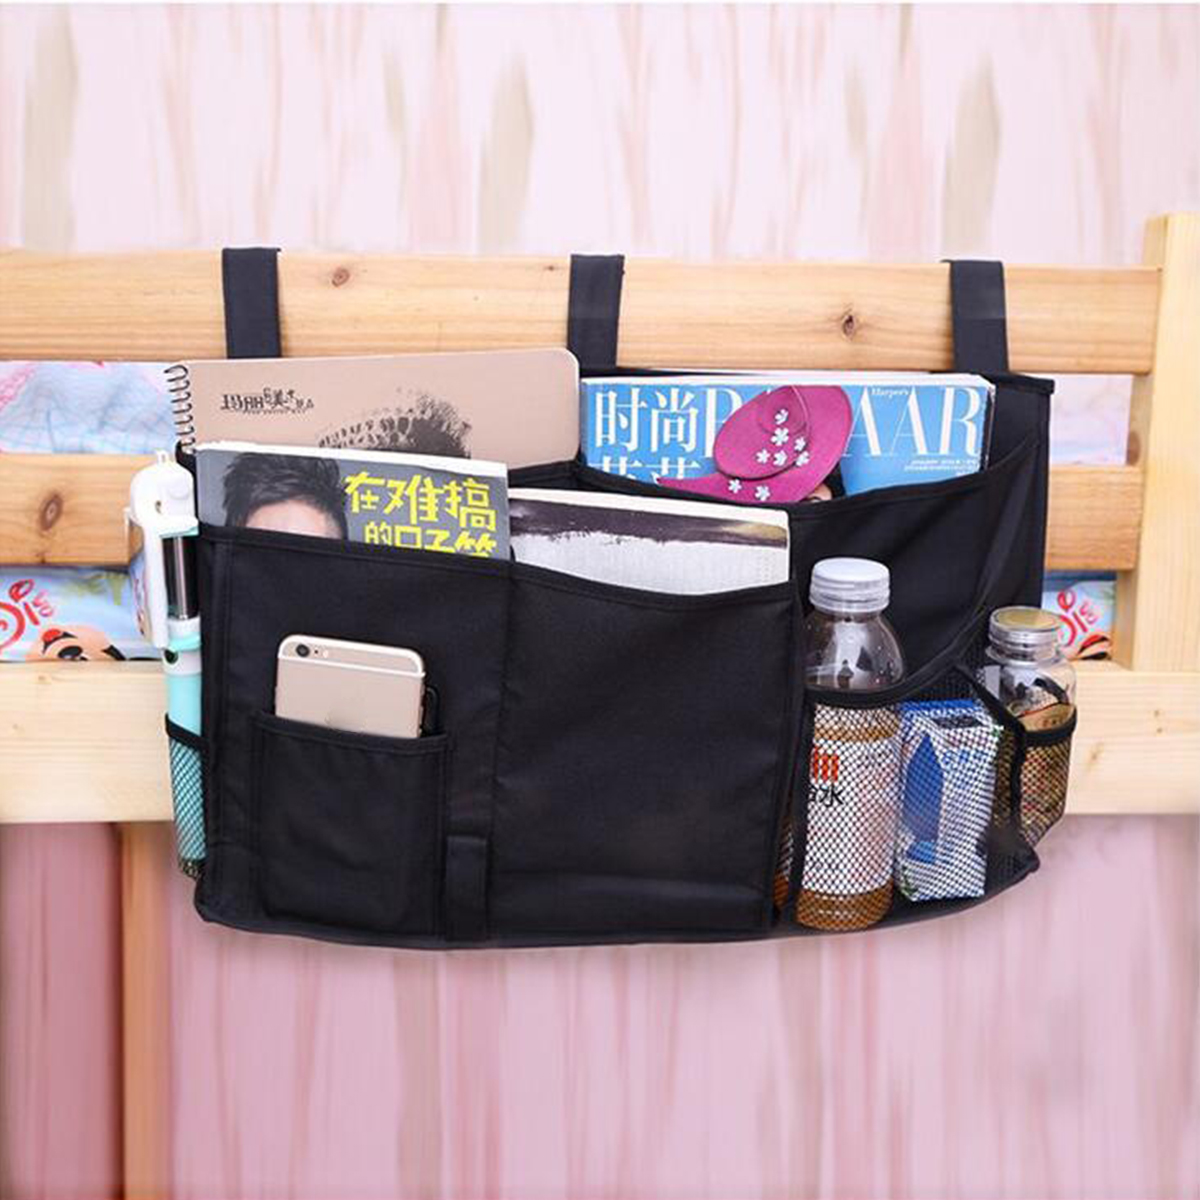 Houshold Bed Storage Bag Bedside Pockets Felt Wall Door Hanging Bed Storage Organizer Holder for Table Sofa Chairs